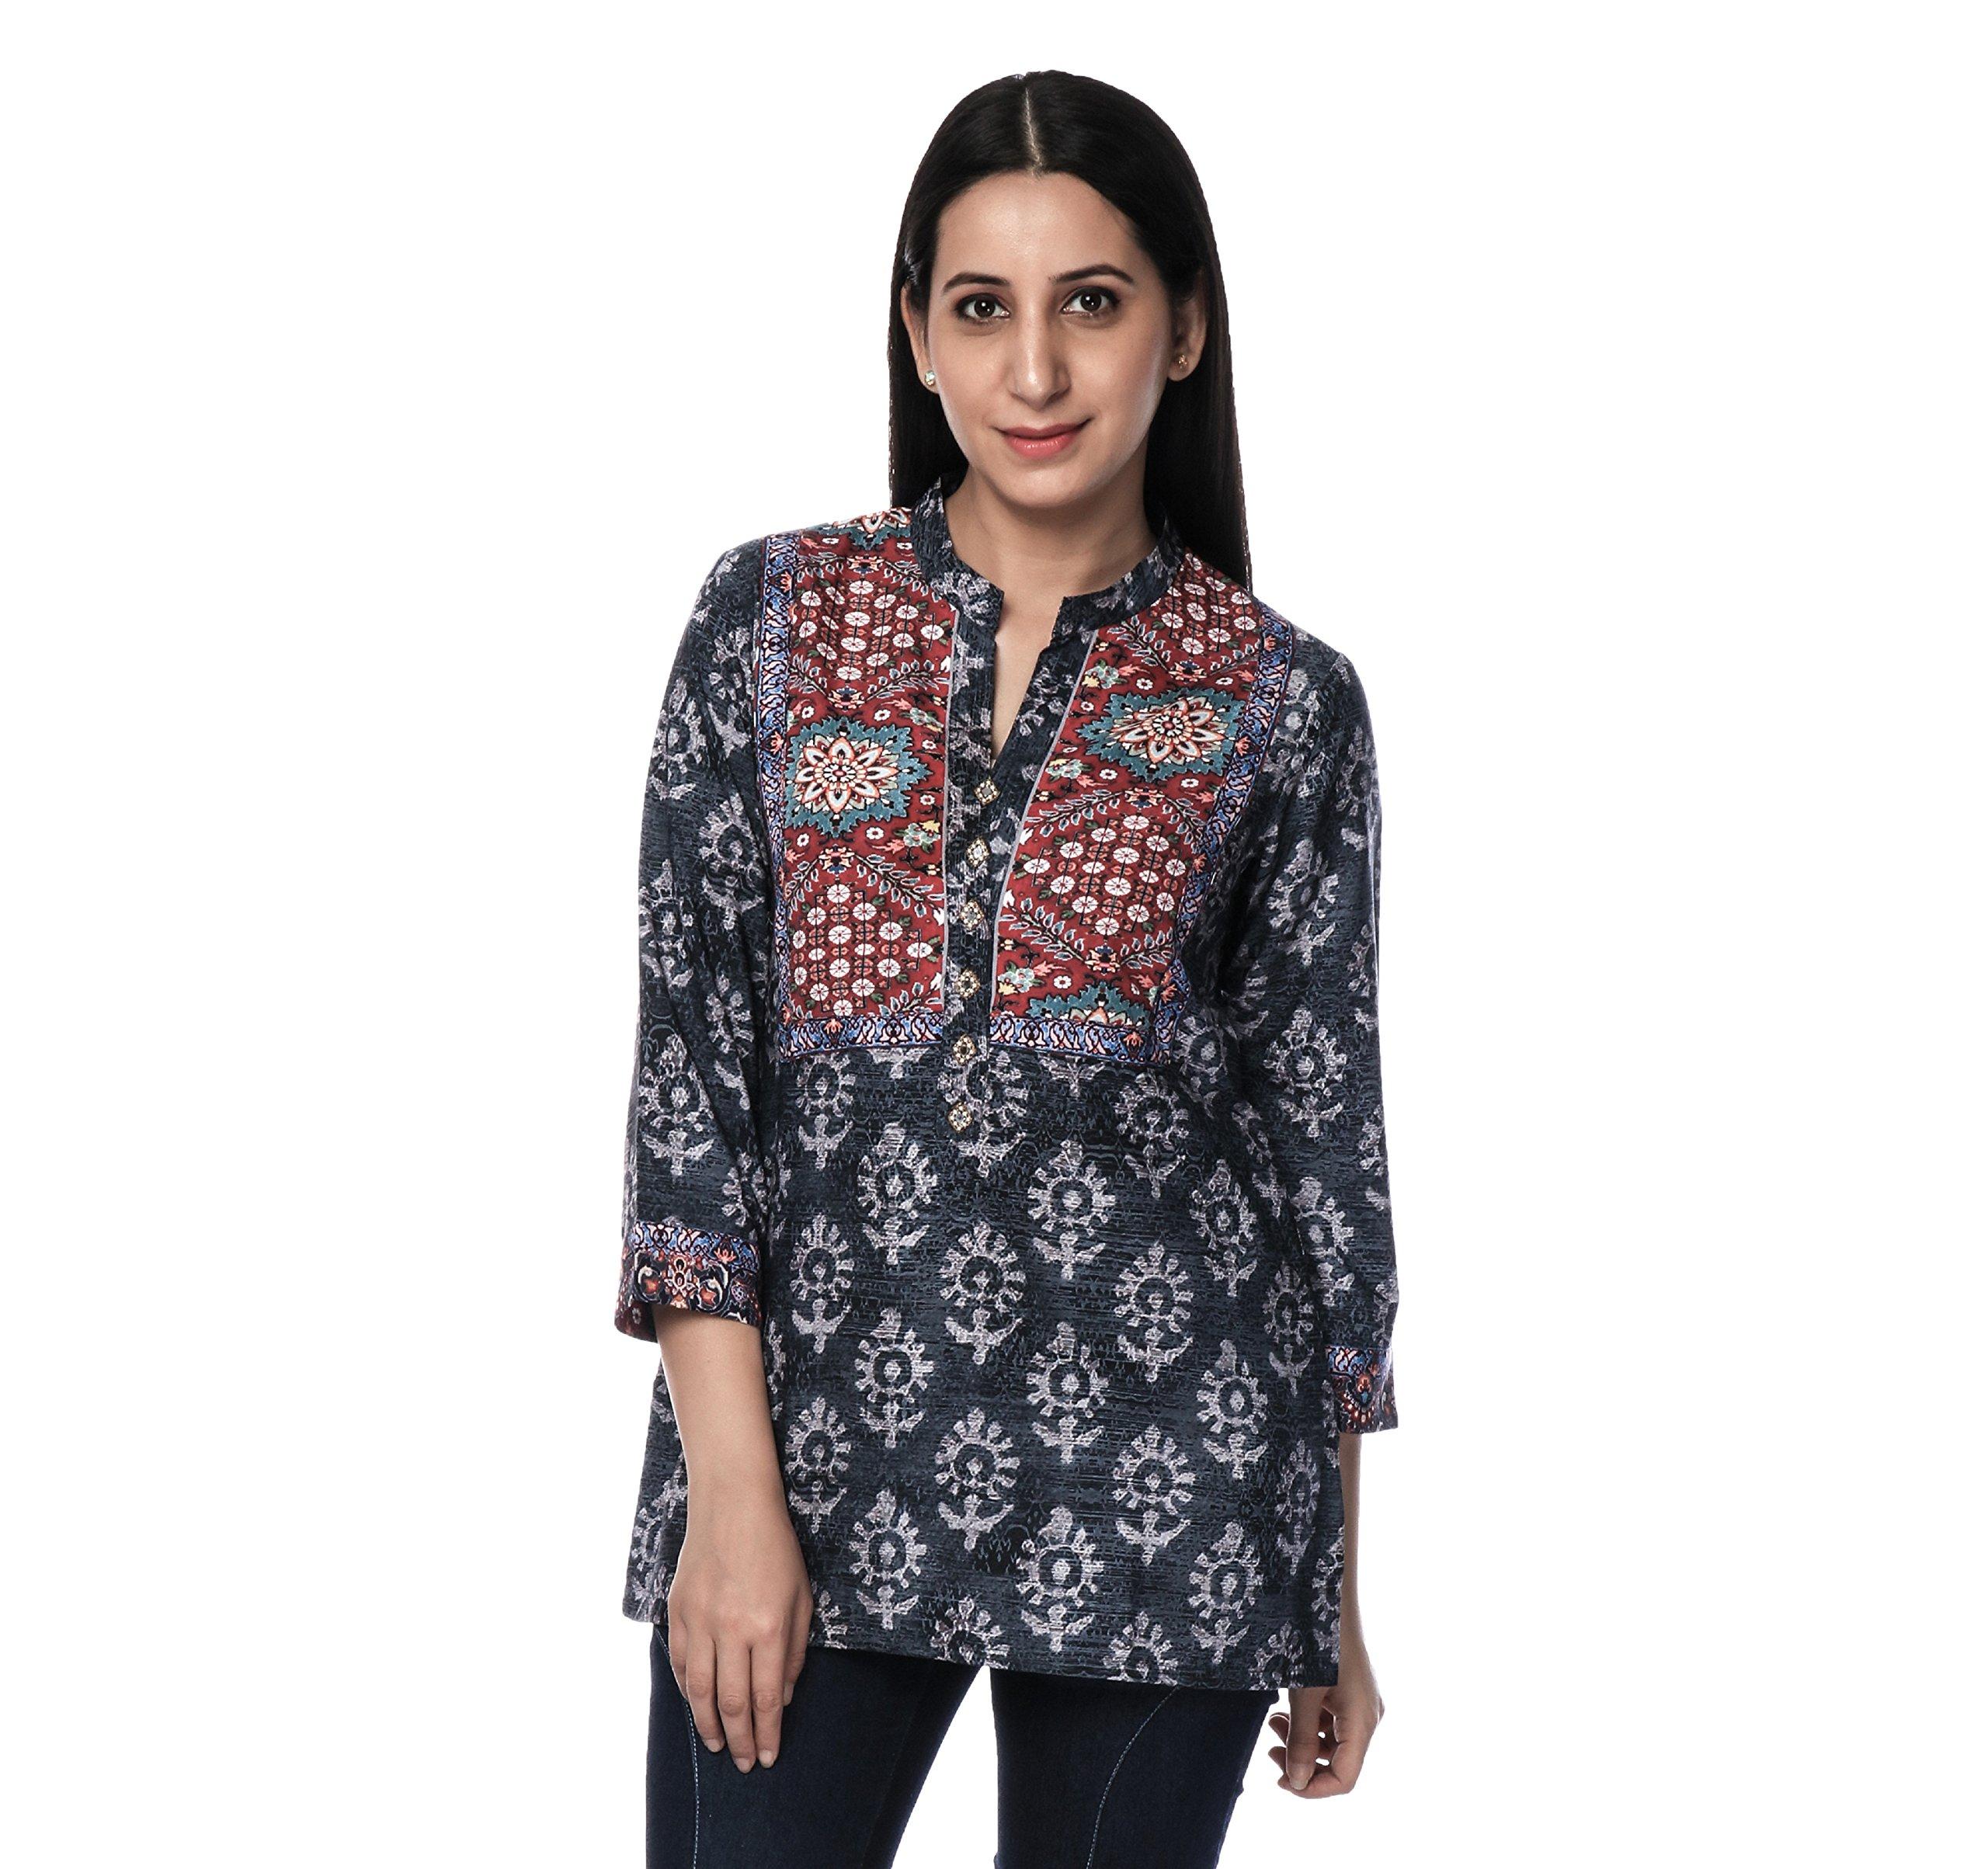 Ria Fashions Indian Kurta Kurti Womens Polyester French Crepe Blouse Tunic Top (2XL(46 in), amz120)